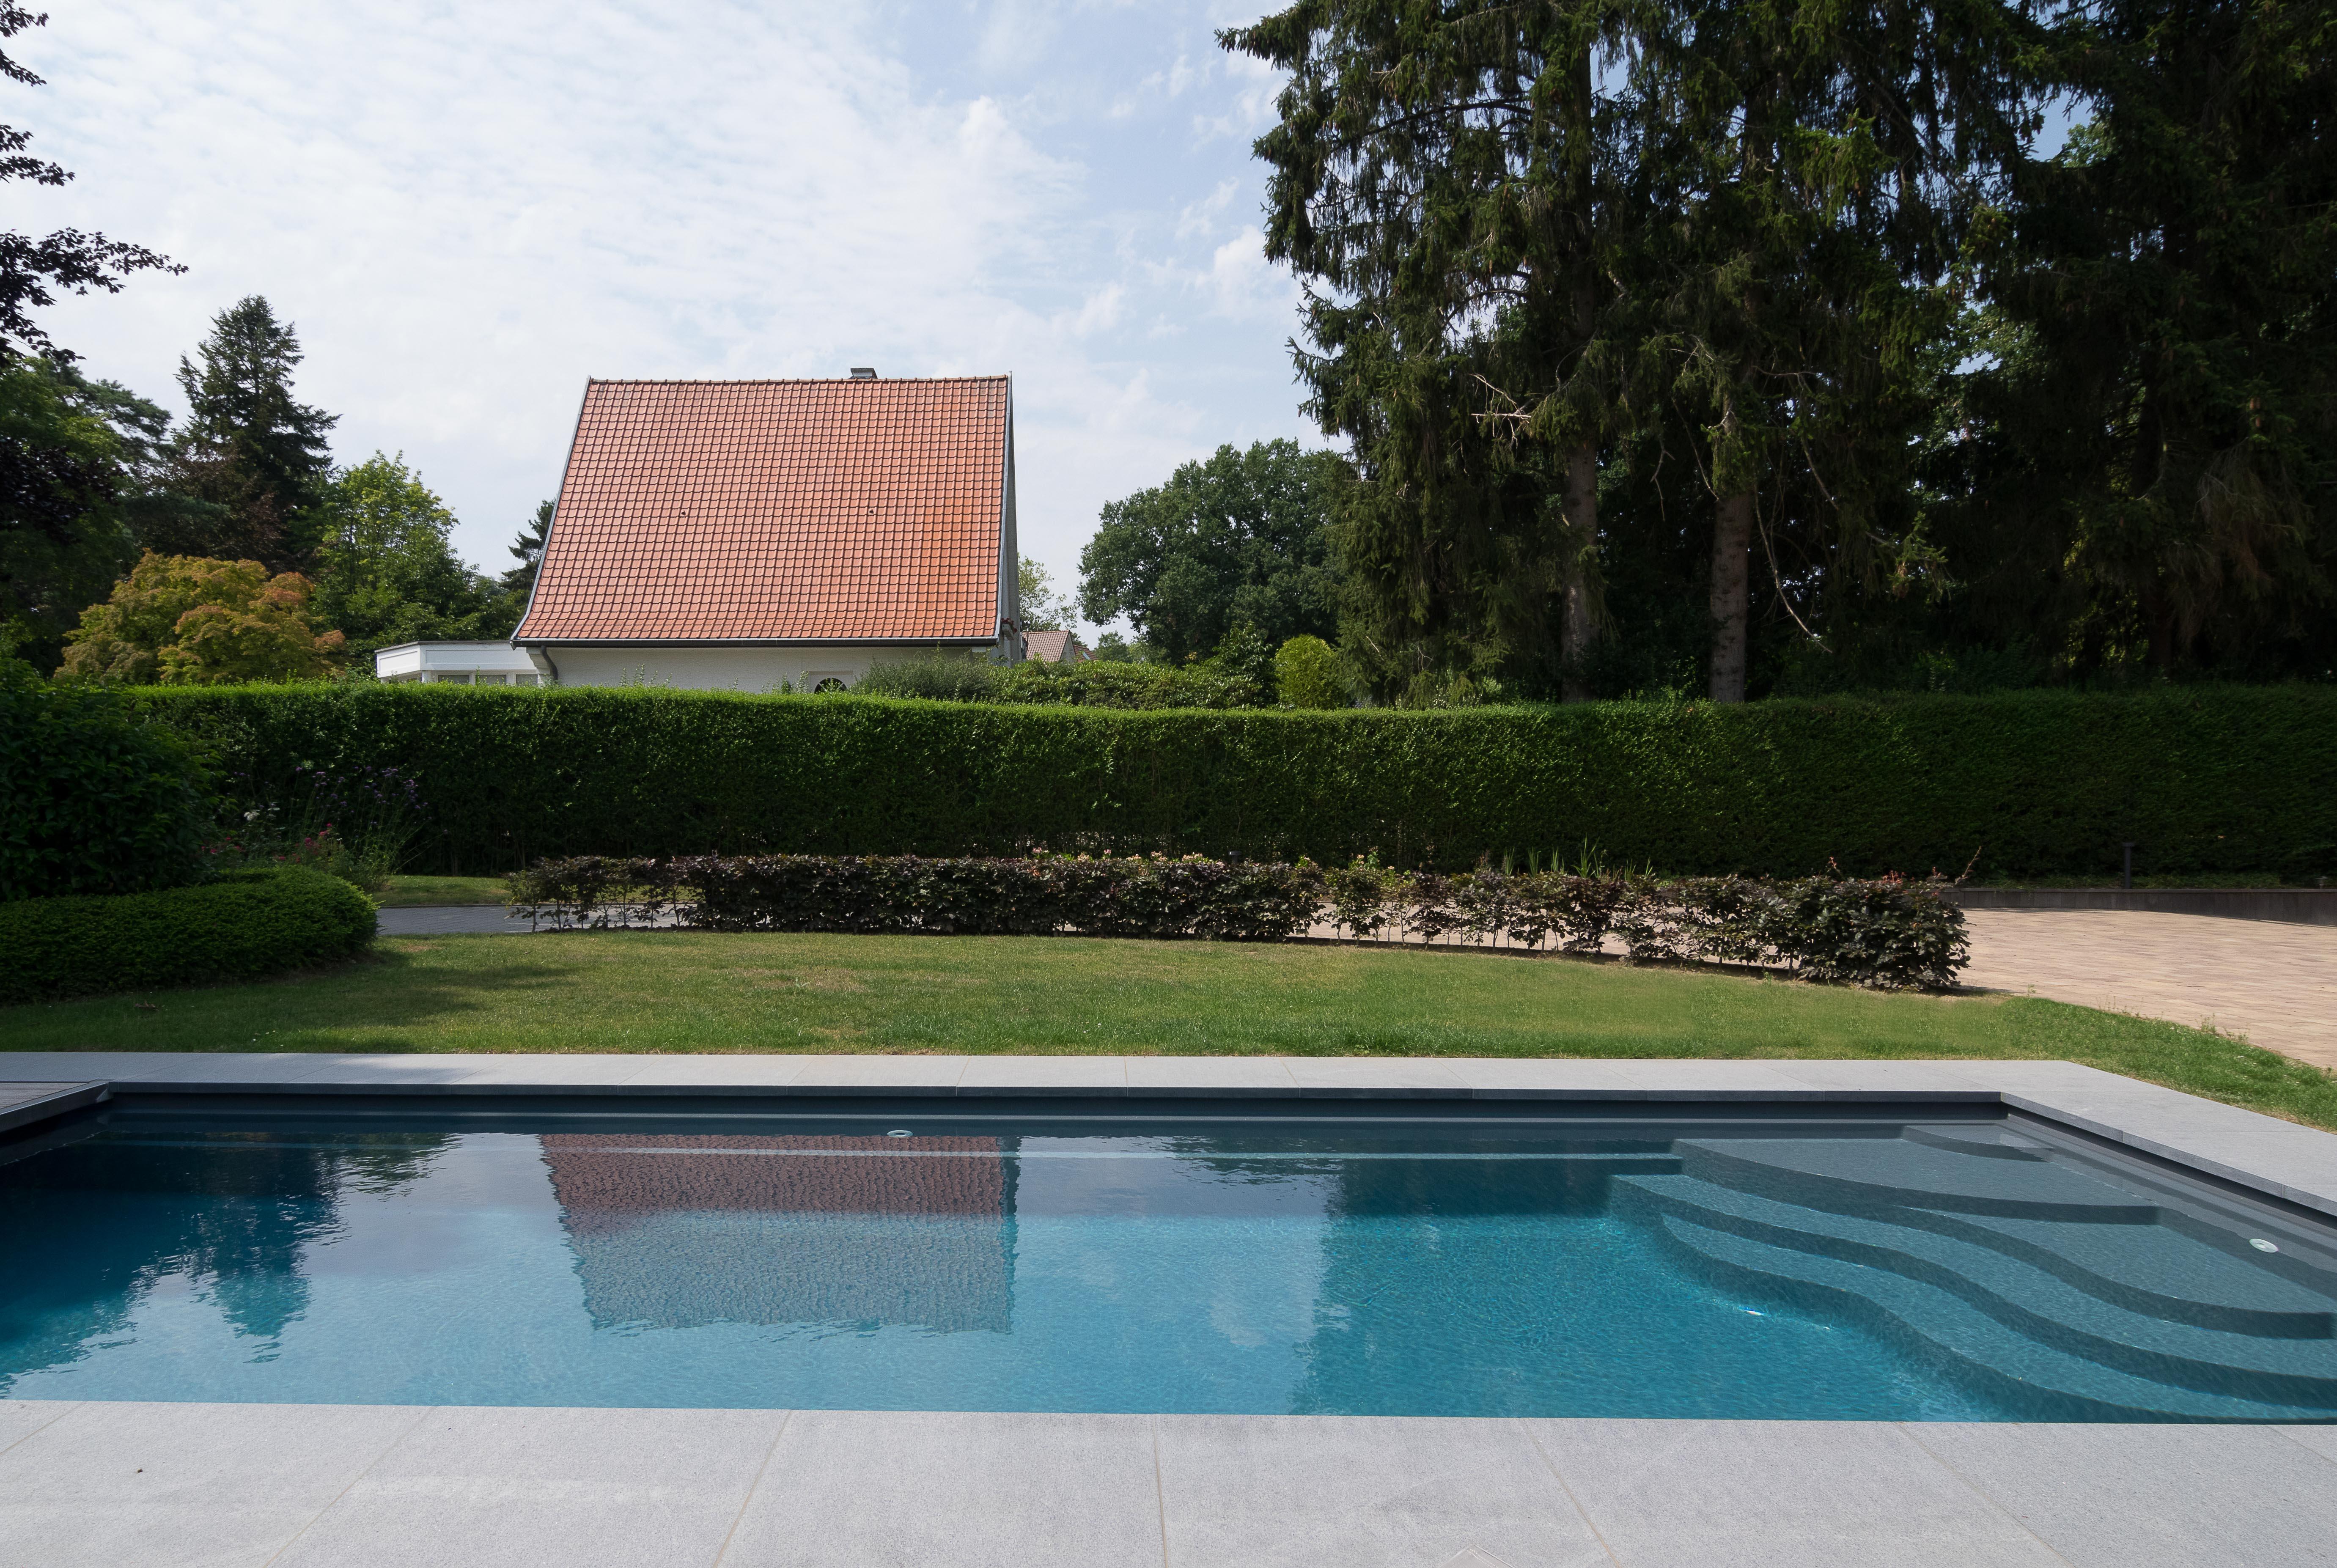 Fabricant belge de piscines polyester mattimmo for Accessoire piscine belgique